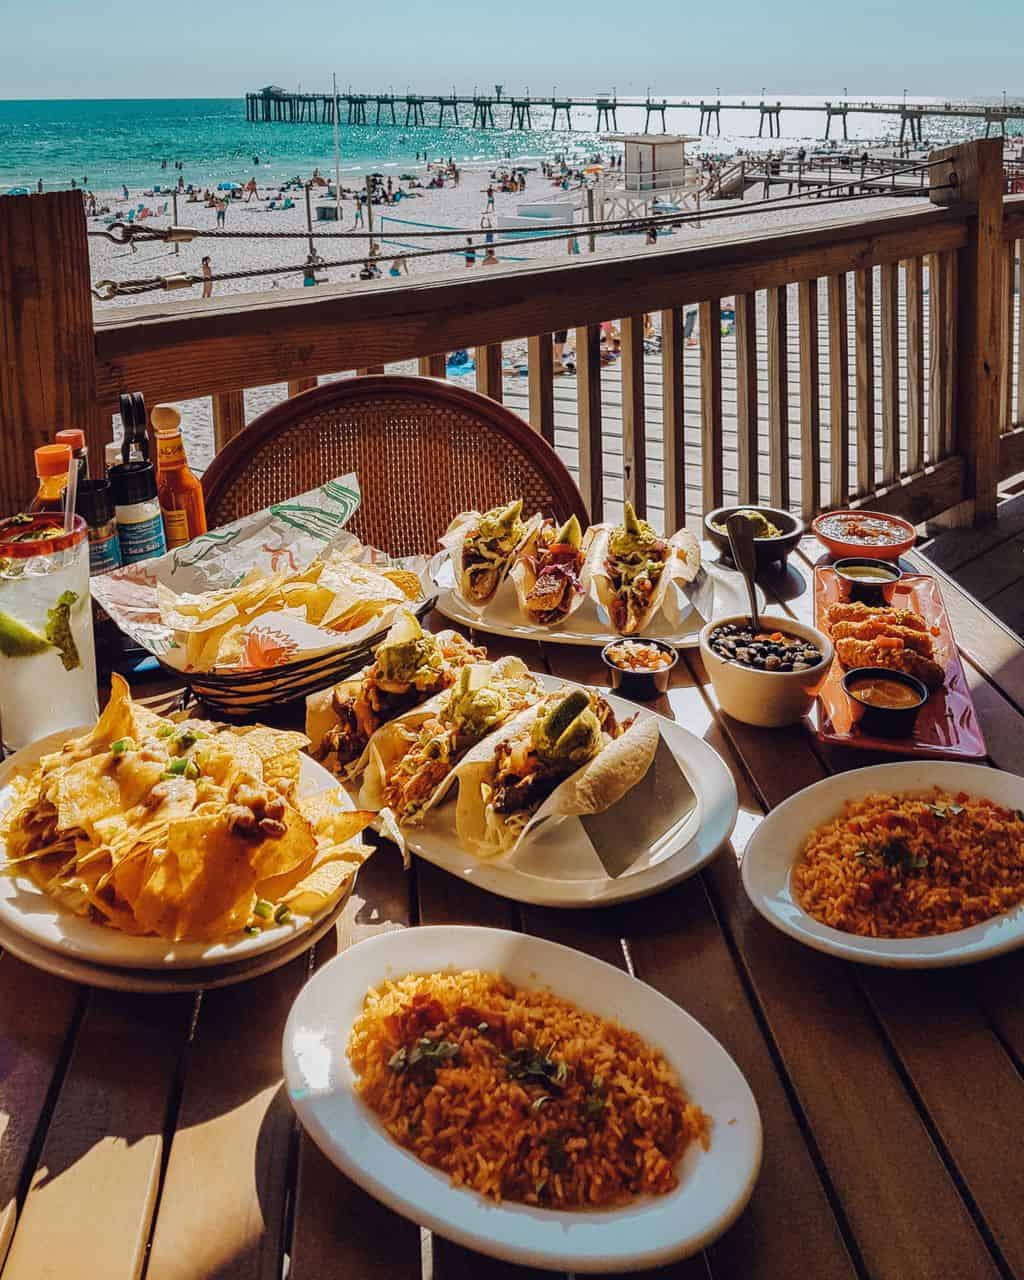 The 10 Best Restaurants On Florida S Emerald Coast Including Destin Fort Walton Beach Pin This Image Pinterest